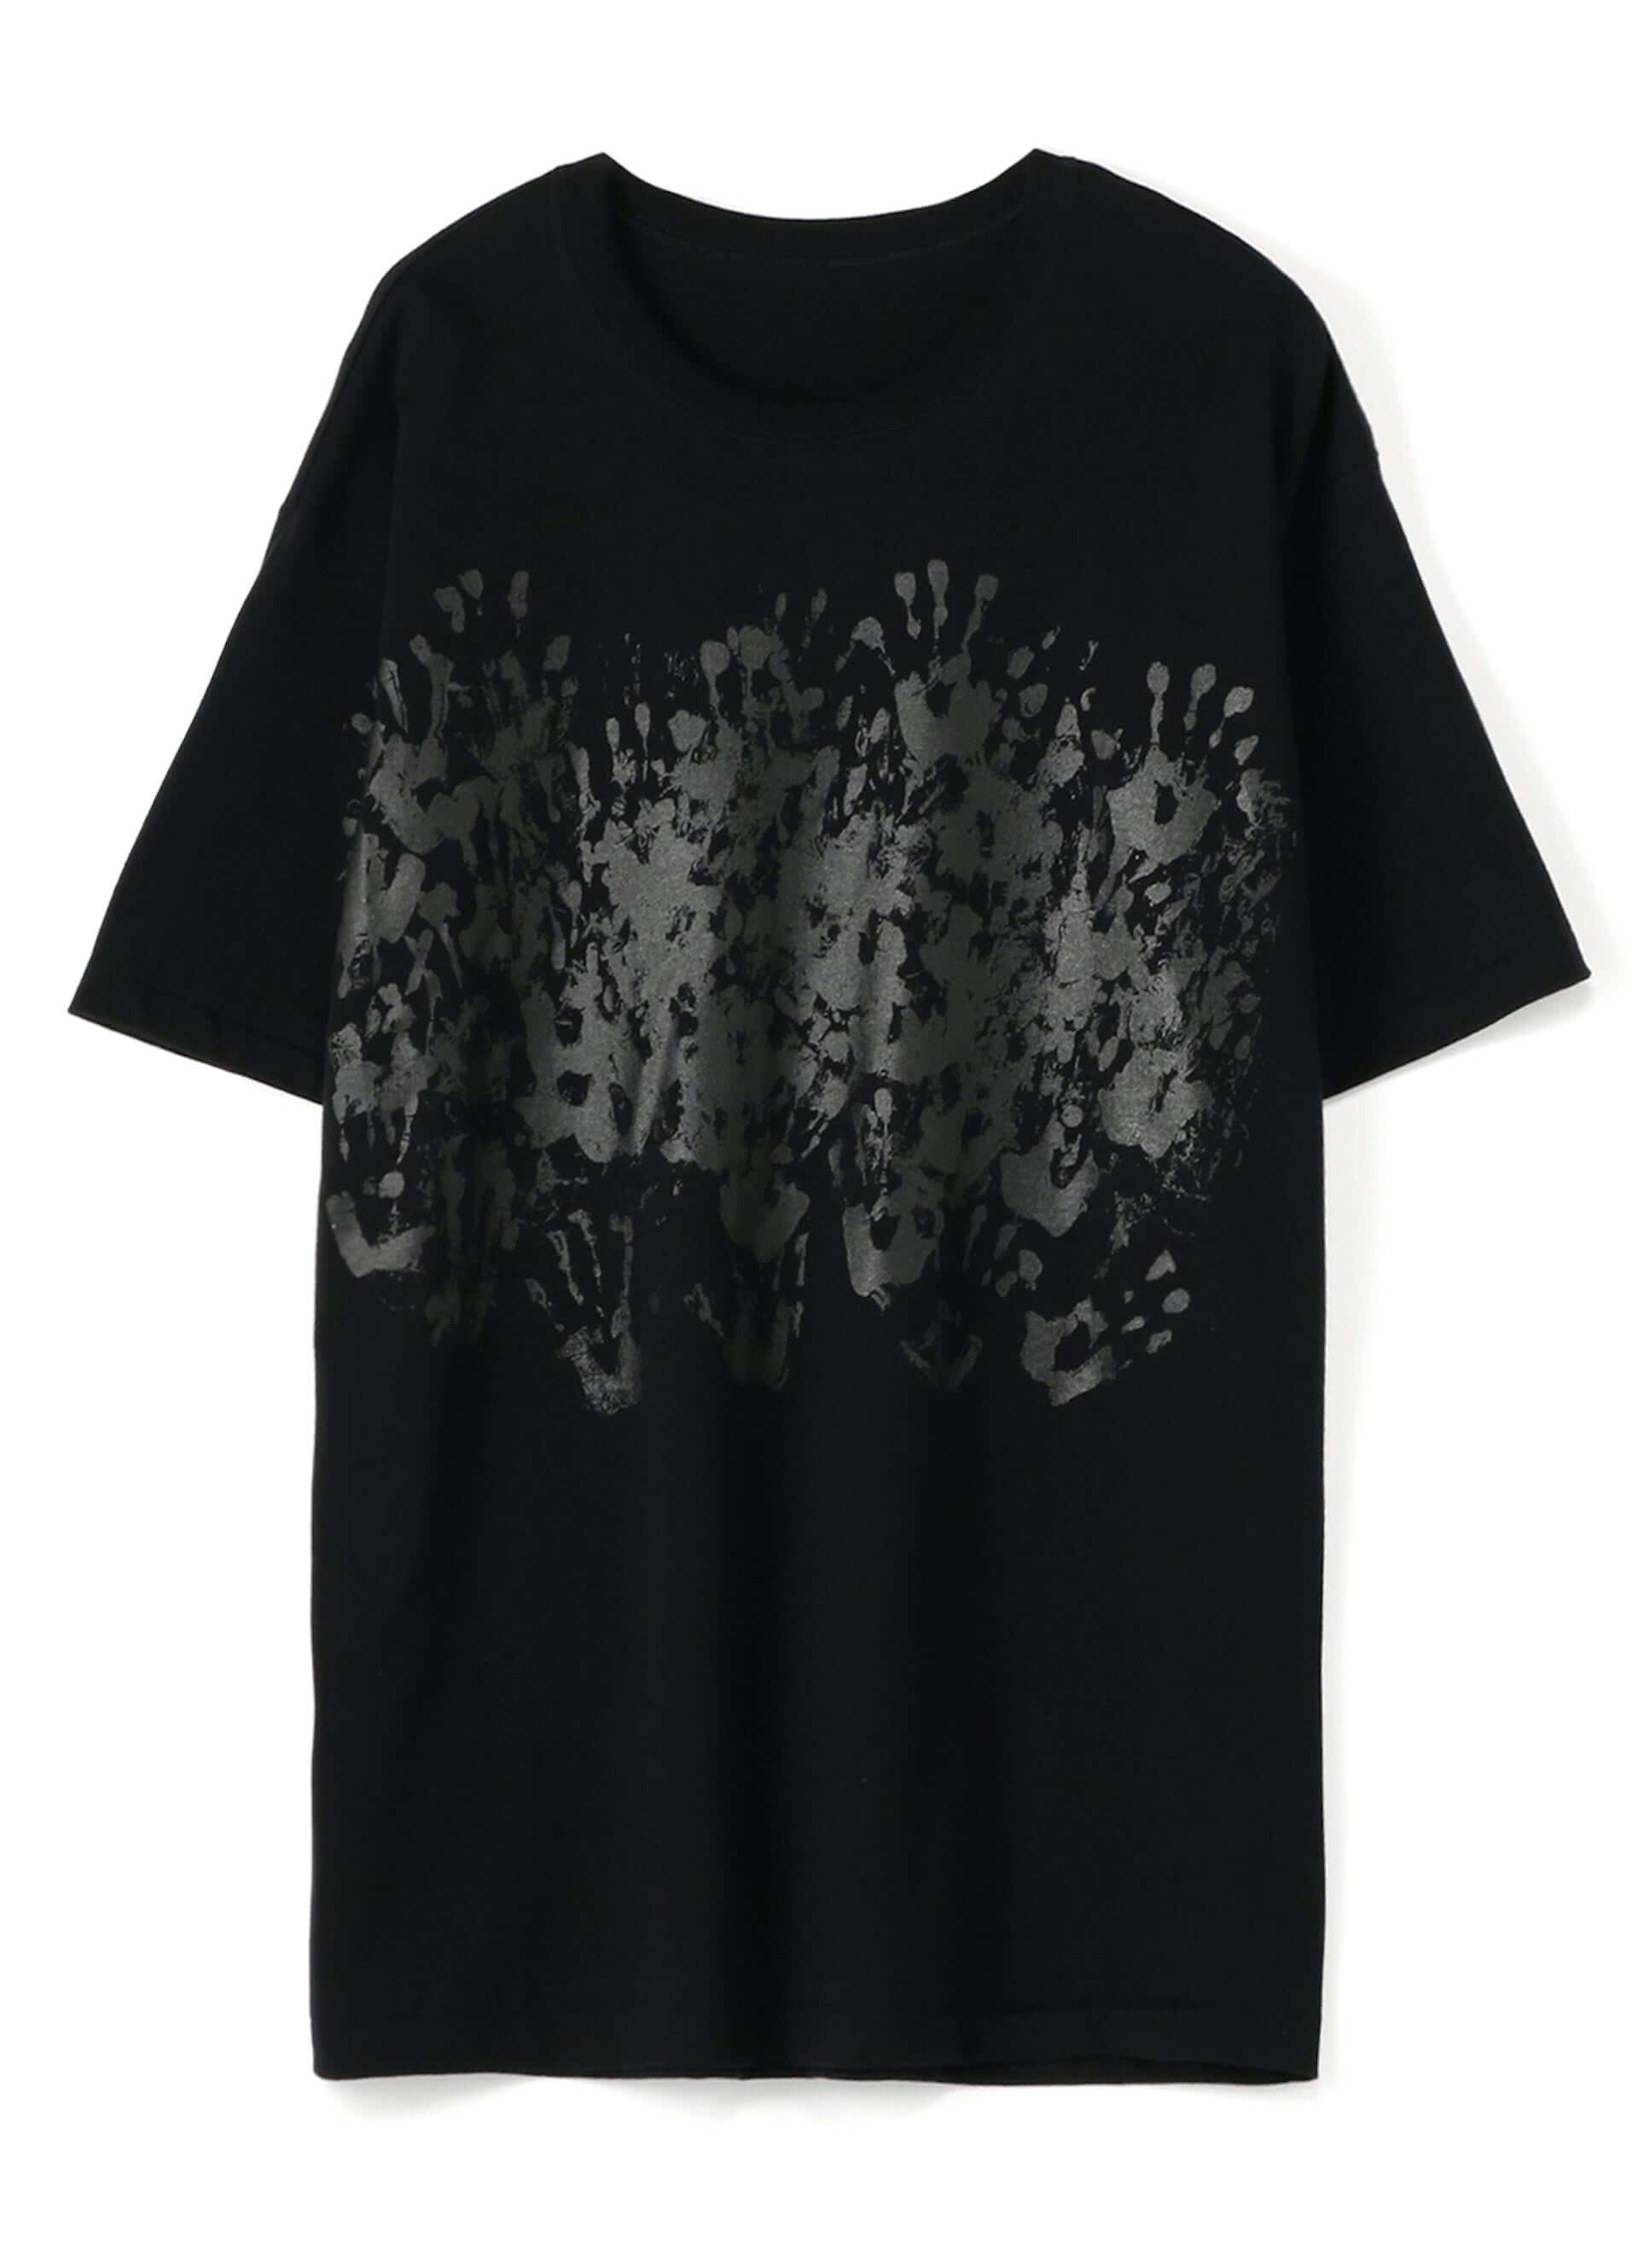 YOHJI YAMAMOTO +NOIRと画家 内田すずめがコラボした「Tシャツ+マスク」が限定販売!鳩や手の平のモチーフ3型 lf200604_yohjiyamamoto_05-1920x2658